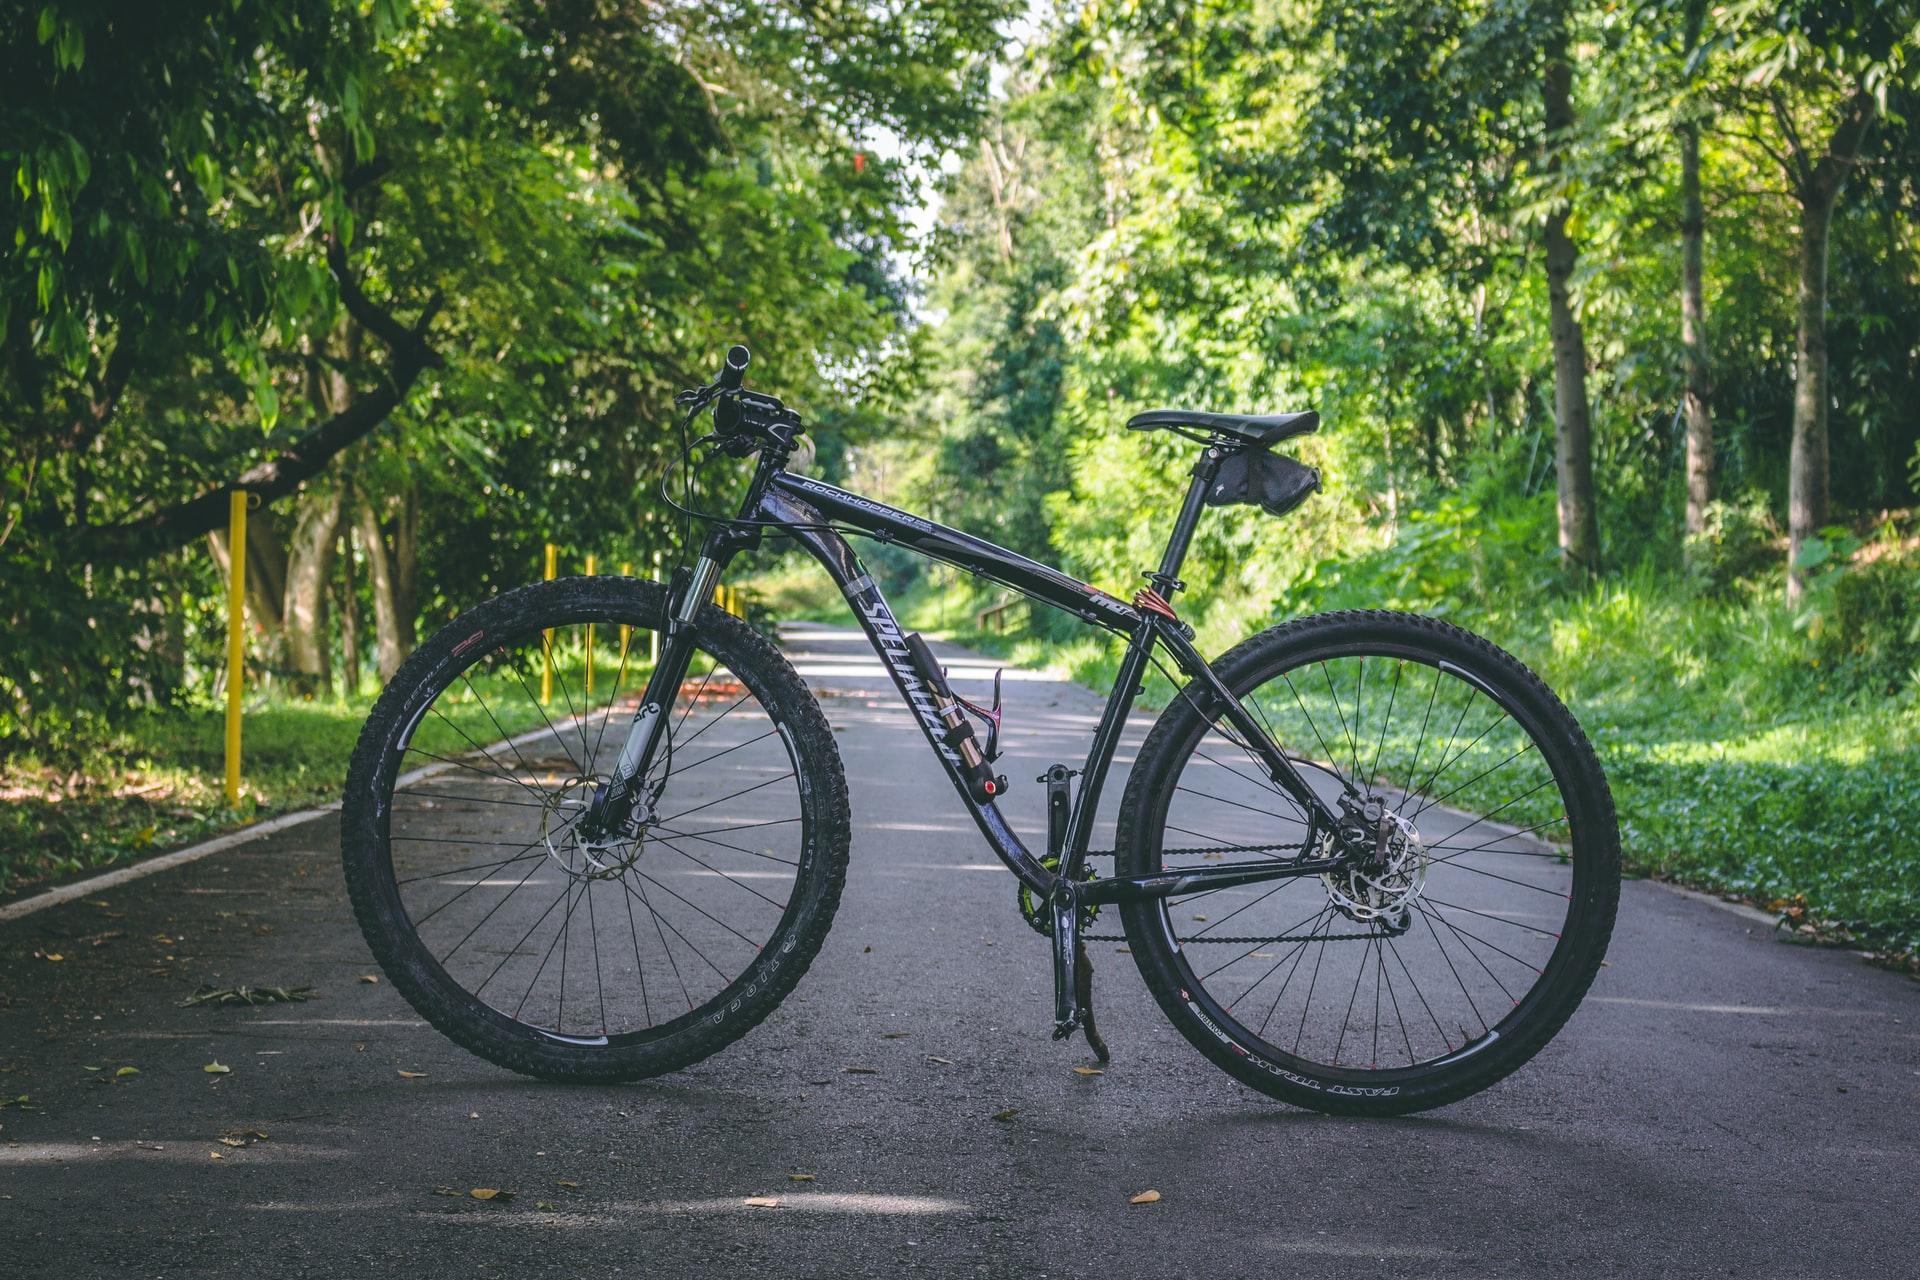 Bike in road with greenery